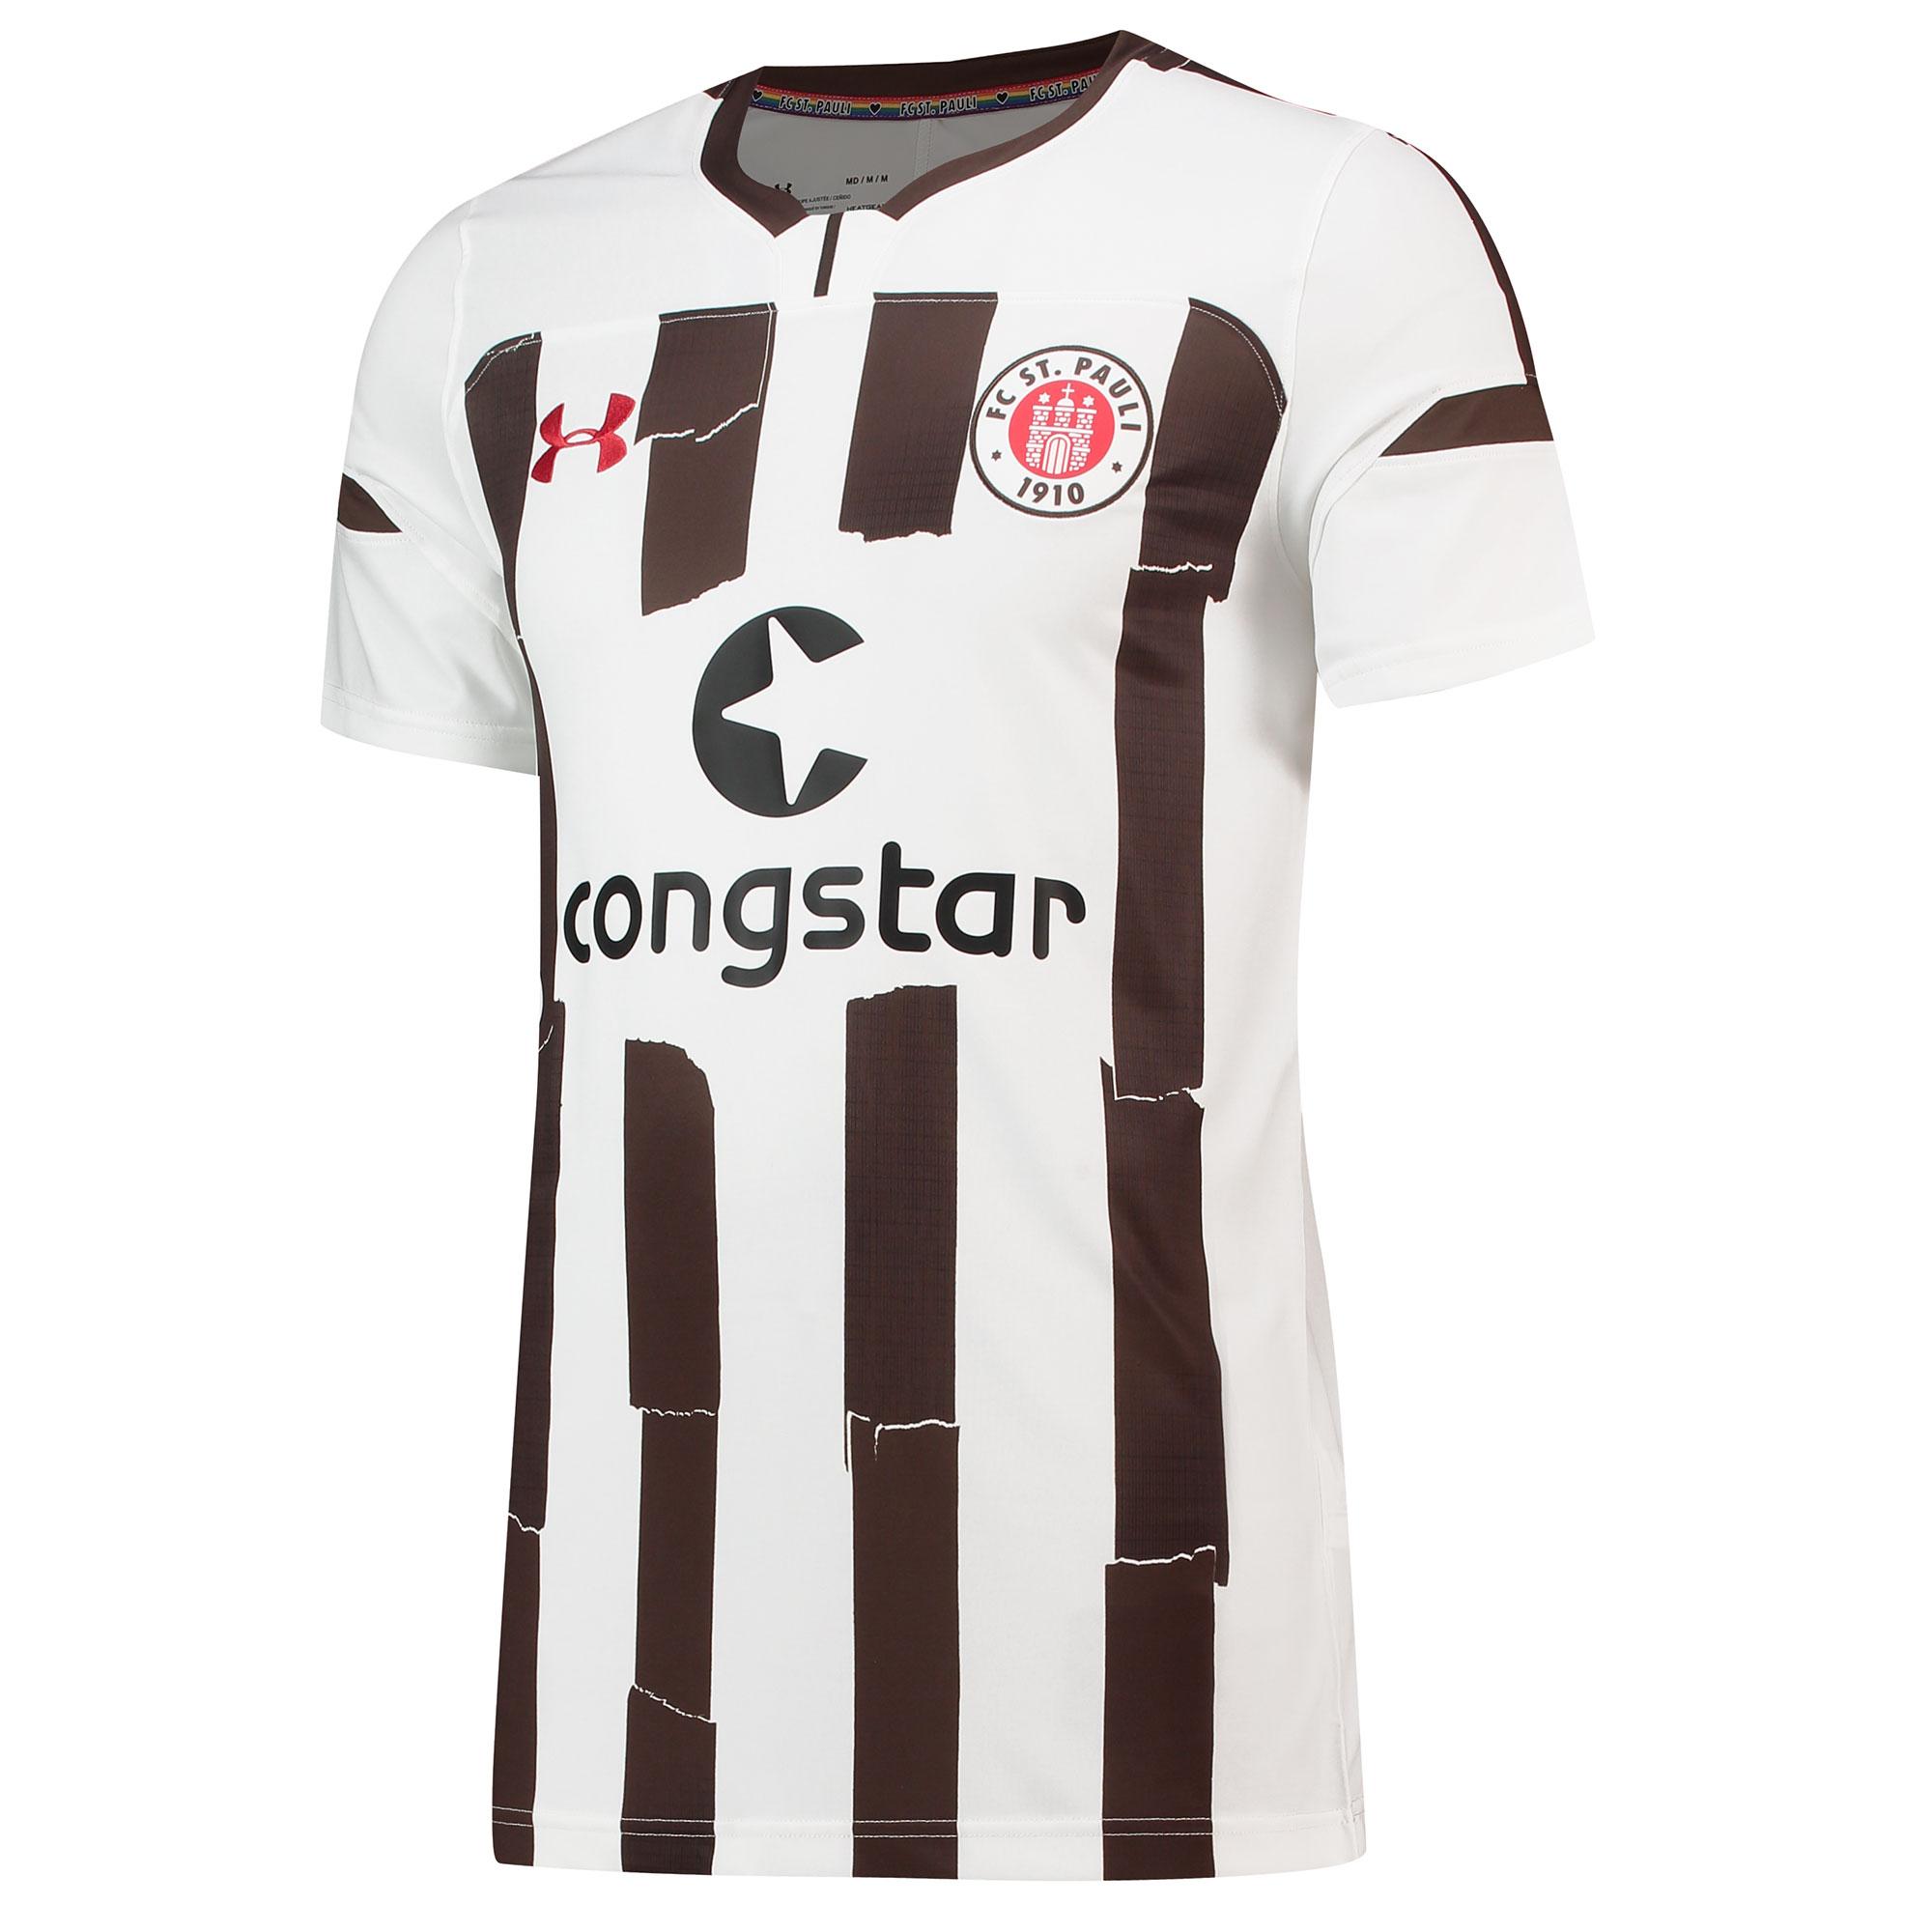 St Pauli St Pauli Away Shirt 2018-19